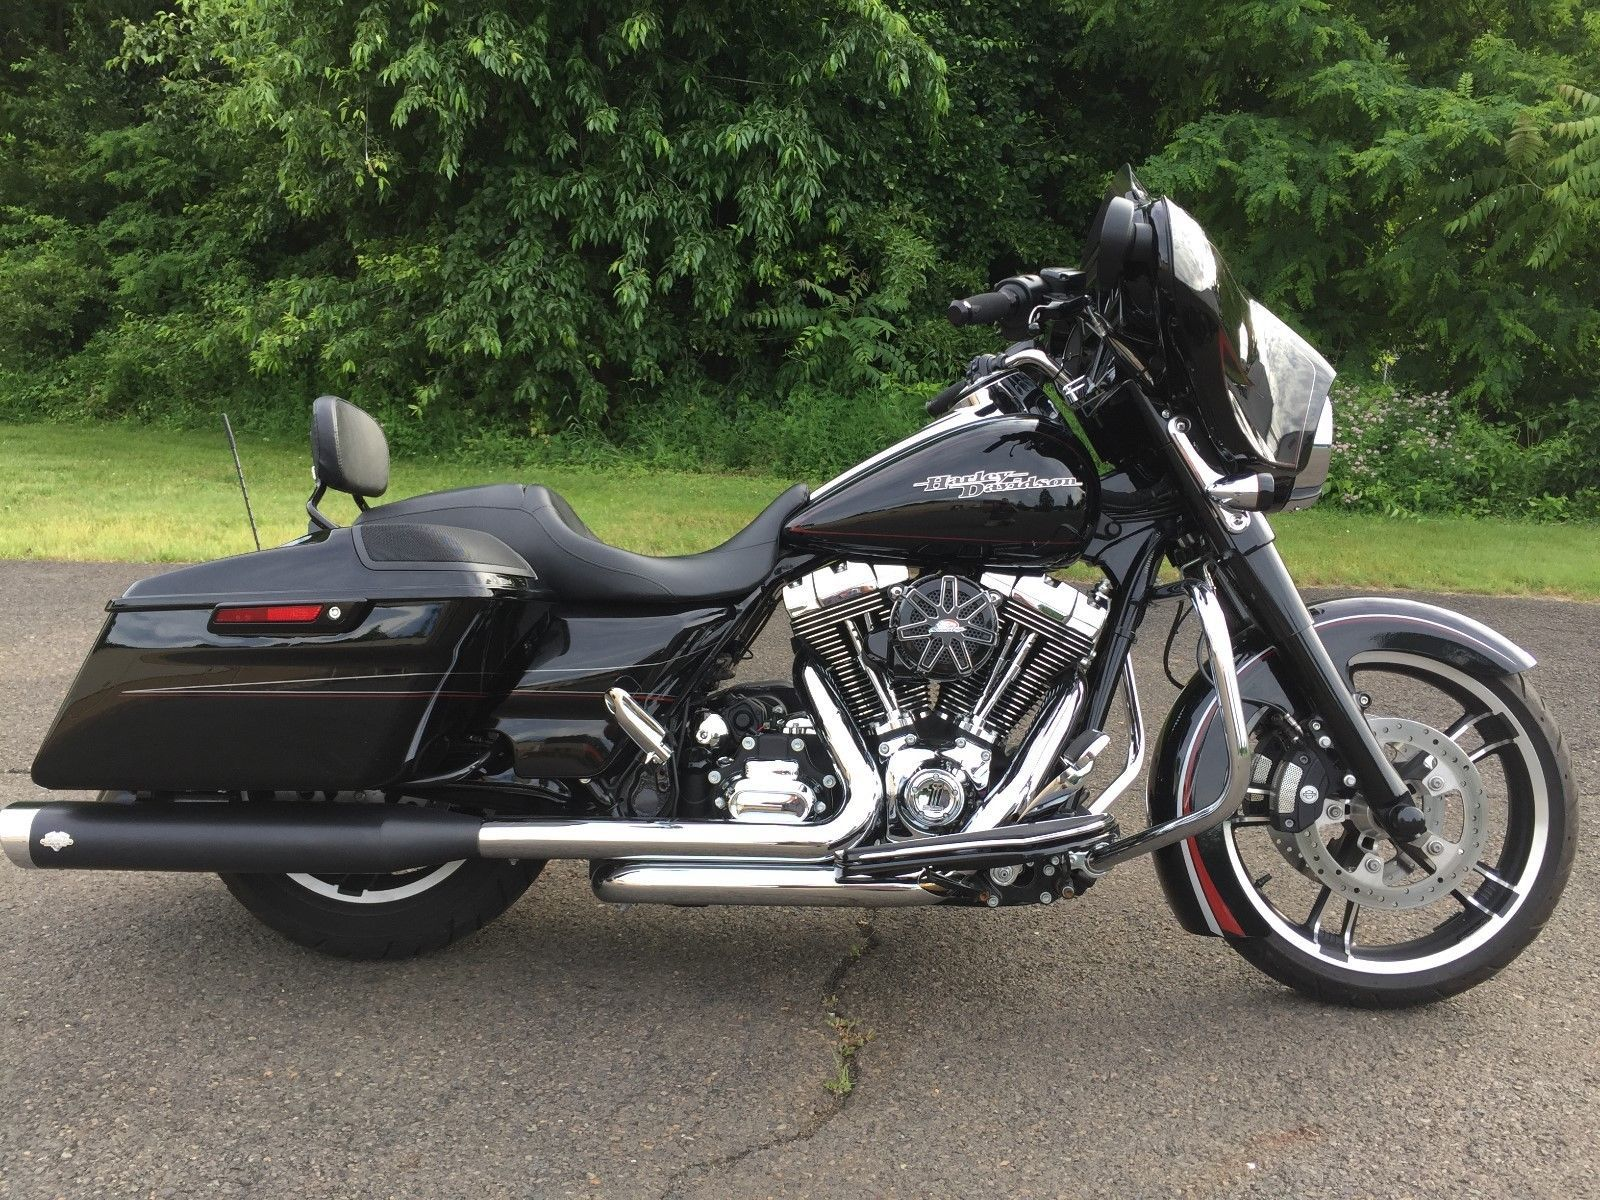 eBay: 2014 Harley-Davidson Touring 2014 STREET GLIDE SPECIAL ...